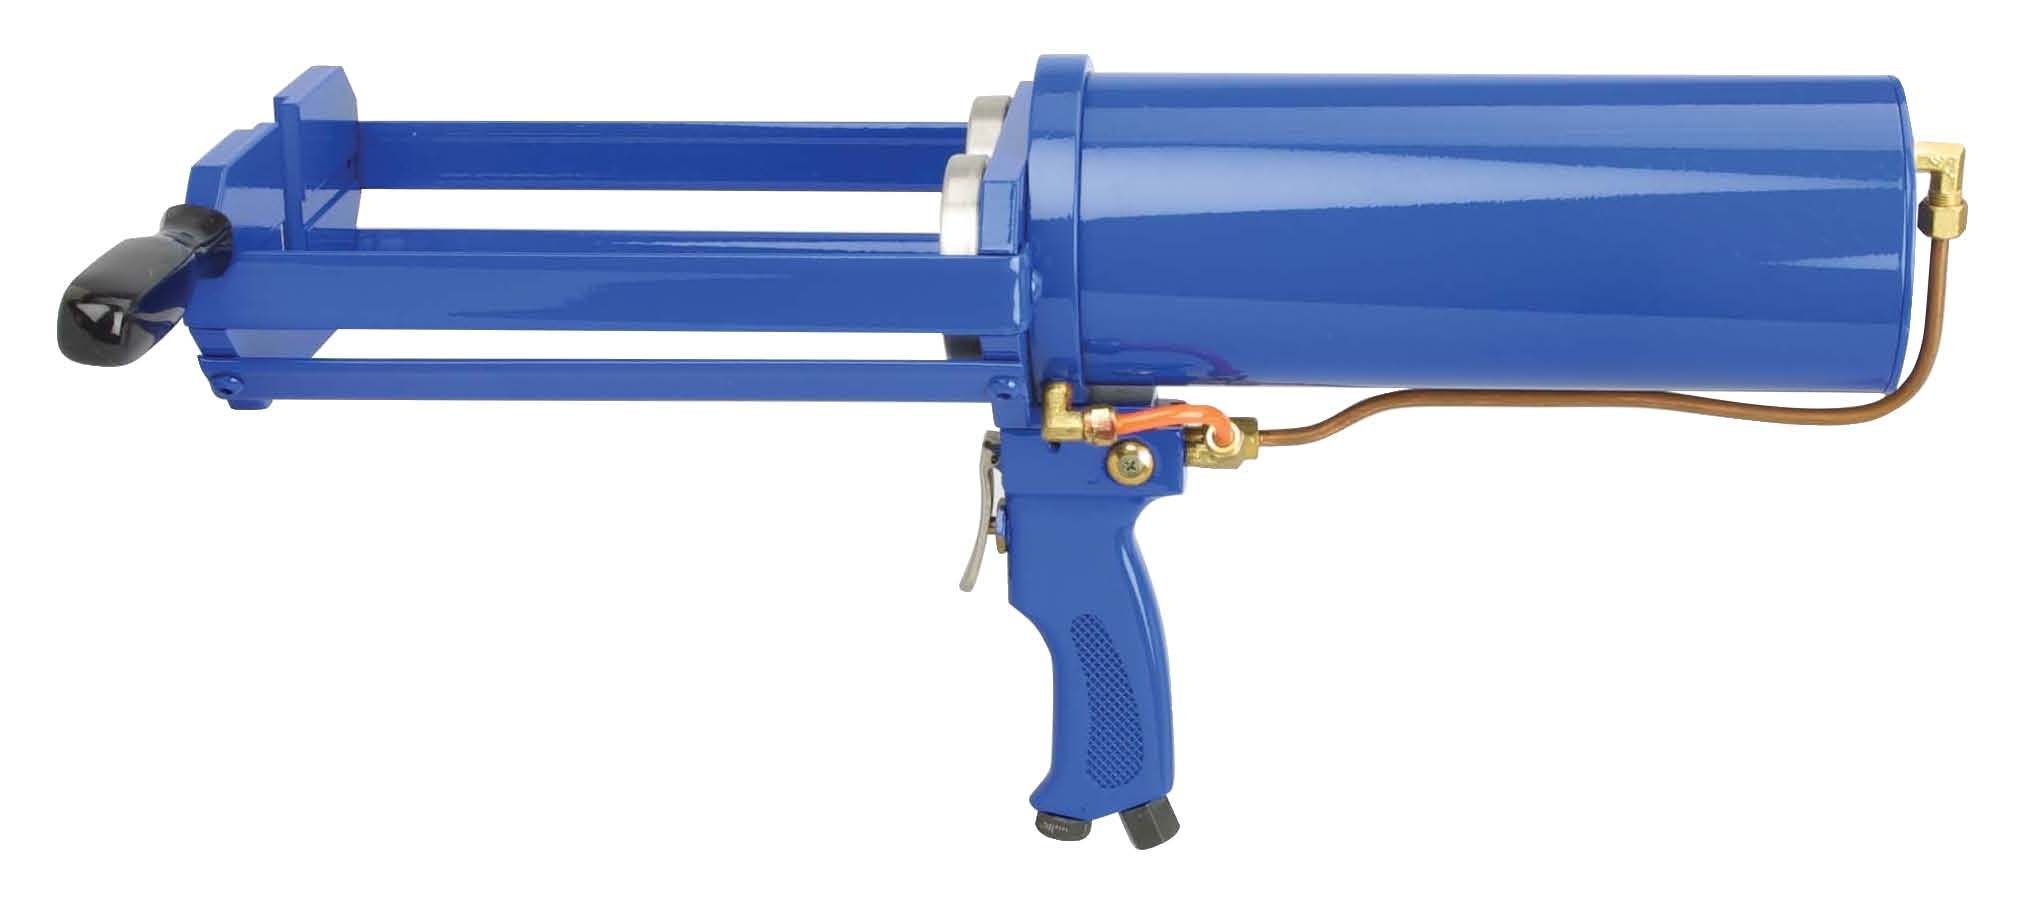 Wellmade Tools AG-400 Dual Cartridge Pneumatic Applicator, 750ml  x 750ml